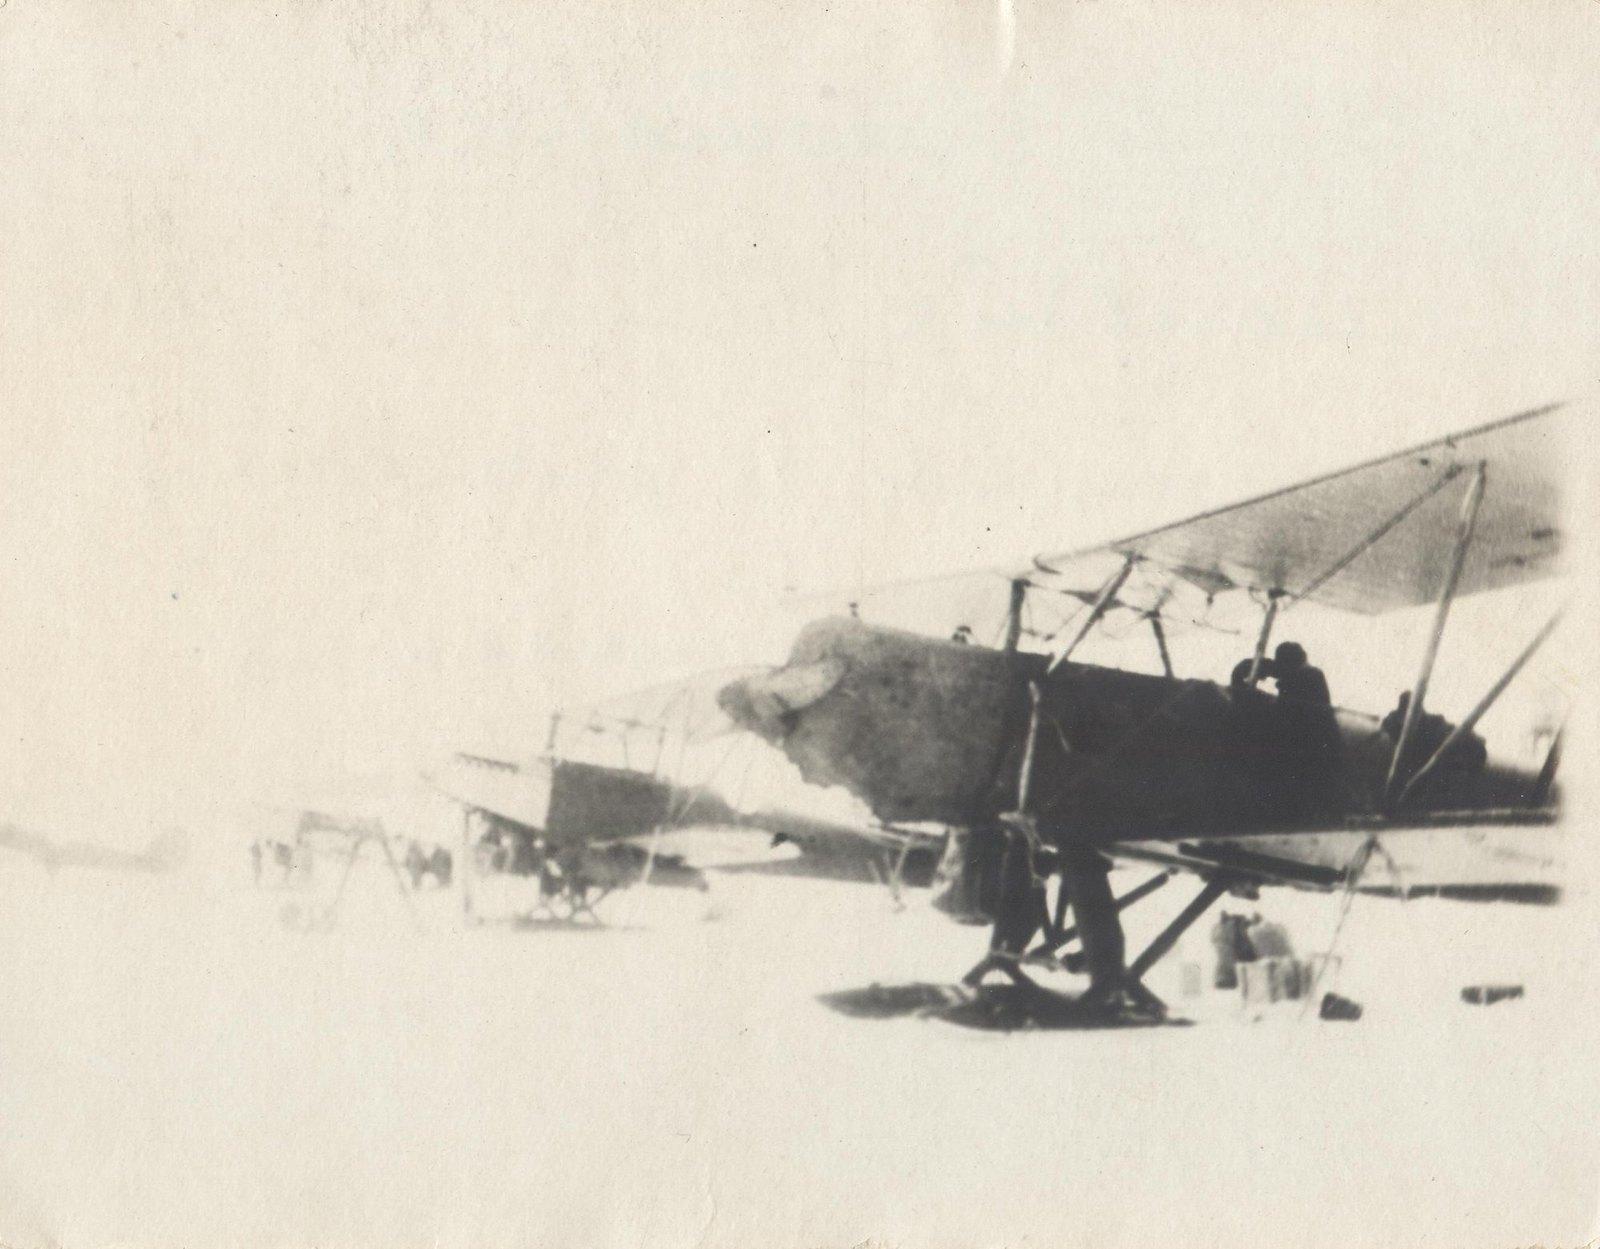 1934. Экспедиция по спасению челюскинцев. Самолеты звена Каманина Н.П.